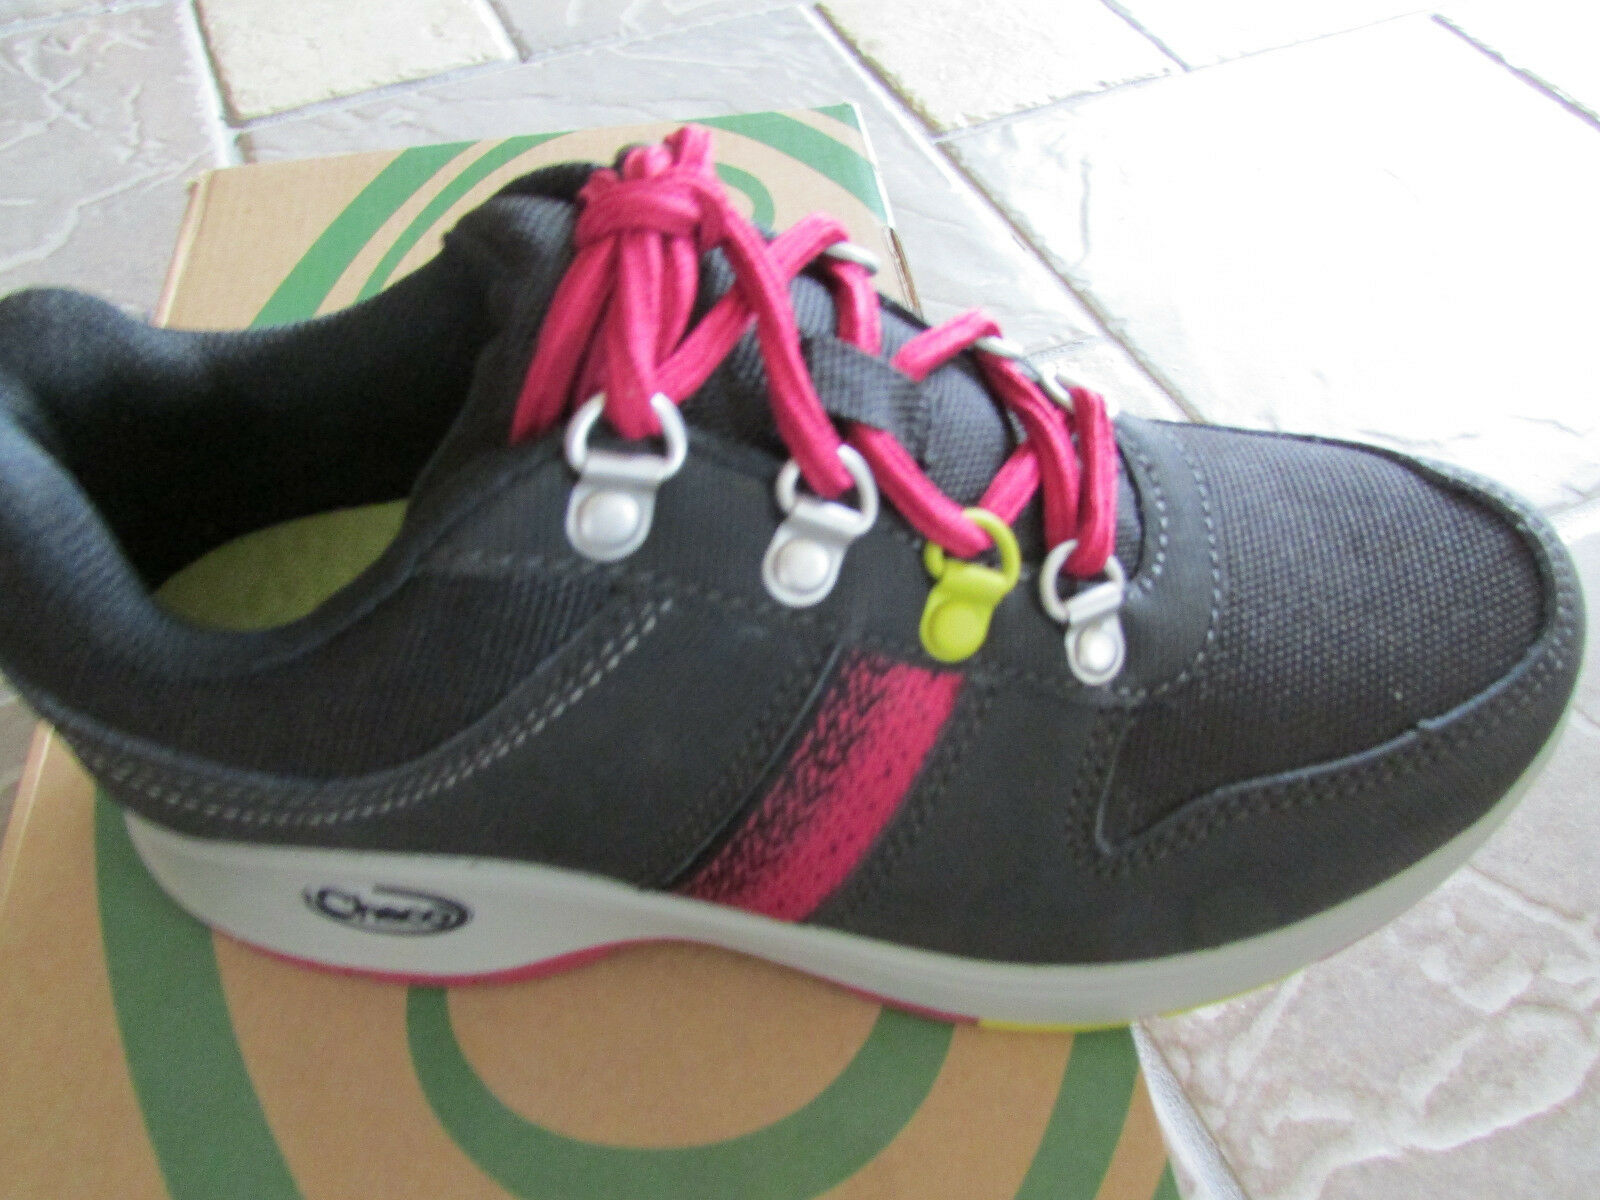 NEWS CHACO VERONA BLACK LACE UP Schuhe Damenschuhe 5 FREE STYLE: J103200 FREE 5 SHIP 3ac259